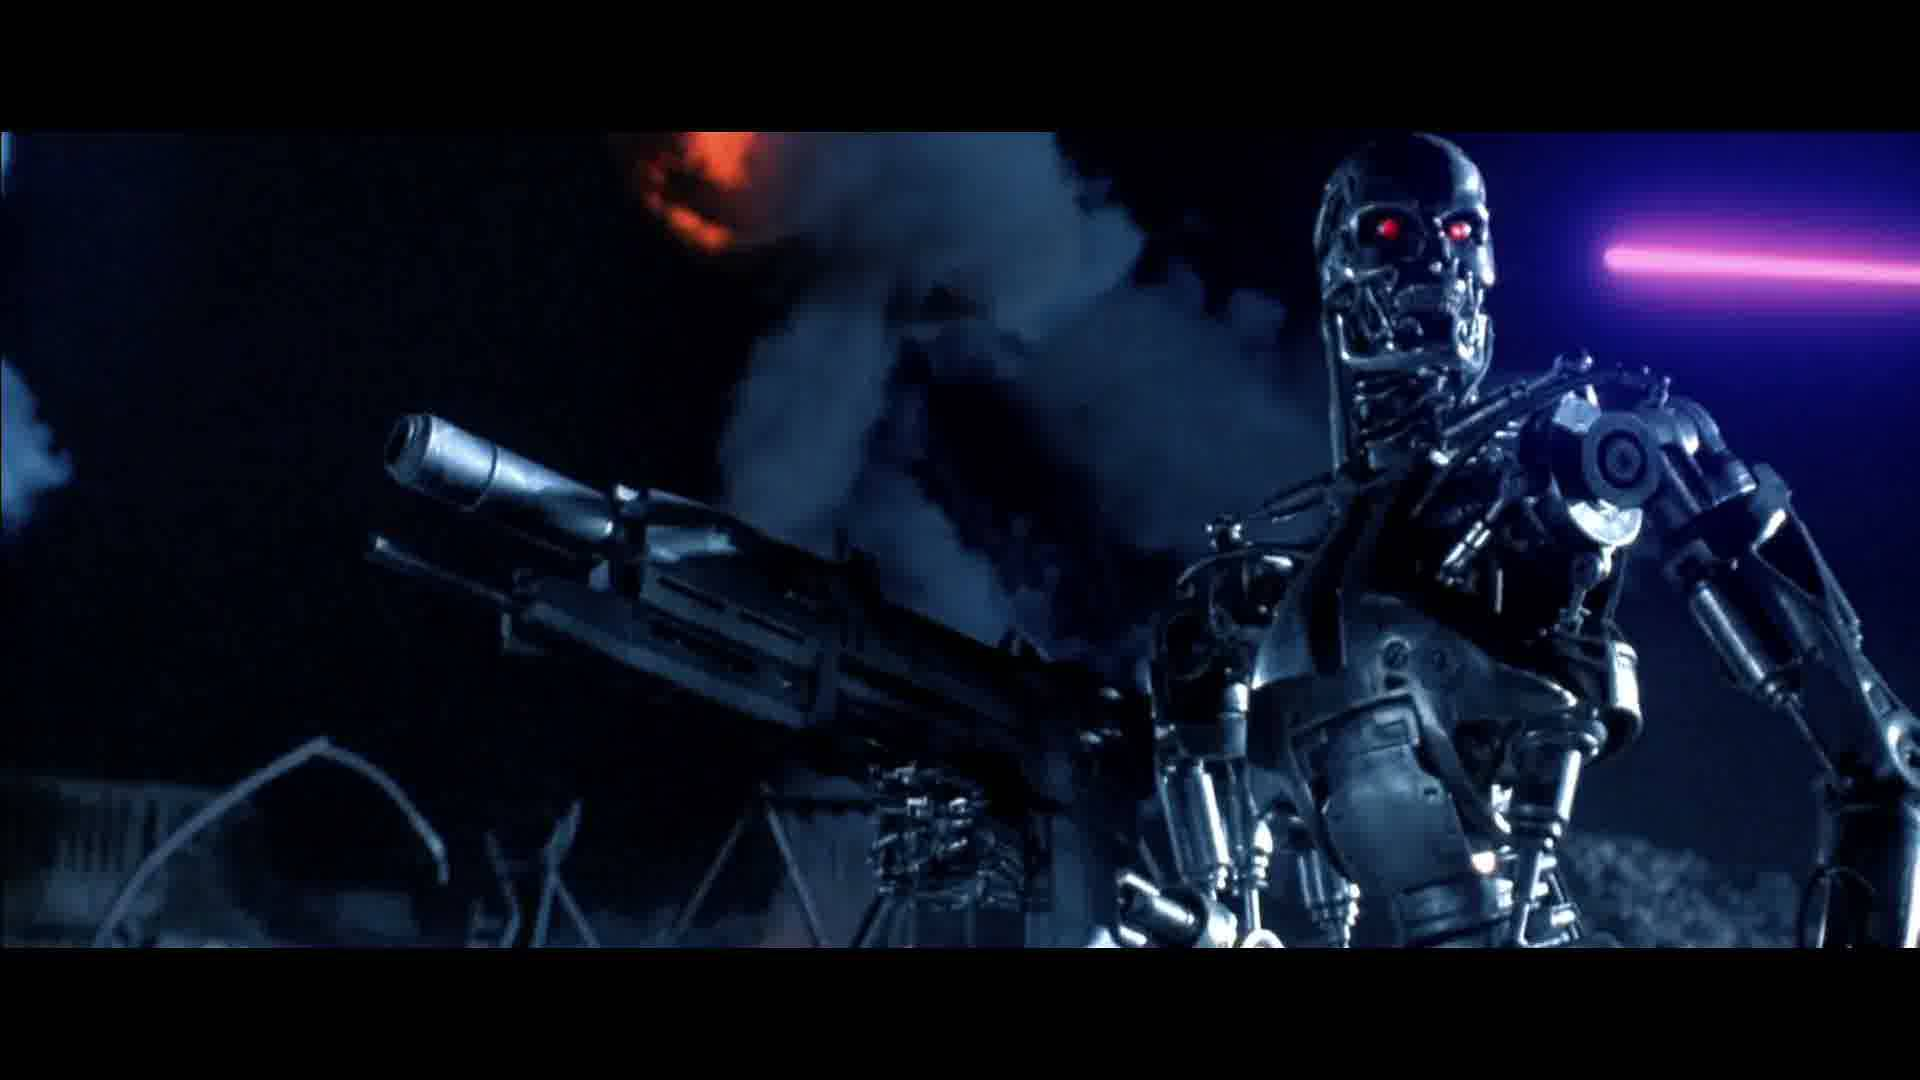 Terminator 2 Wallpaper [1920x1080